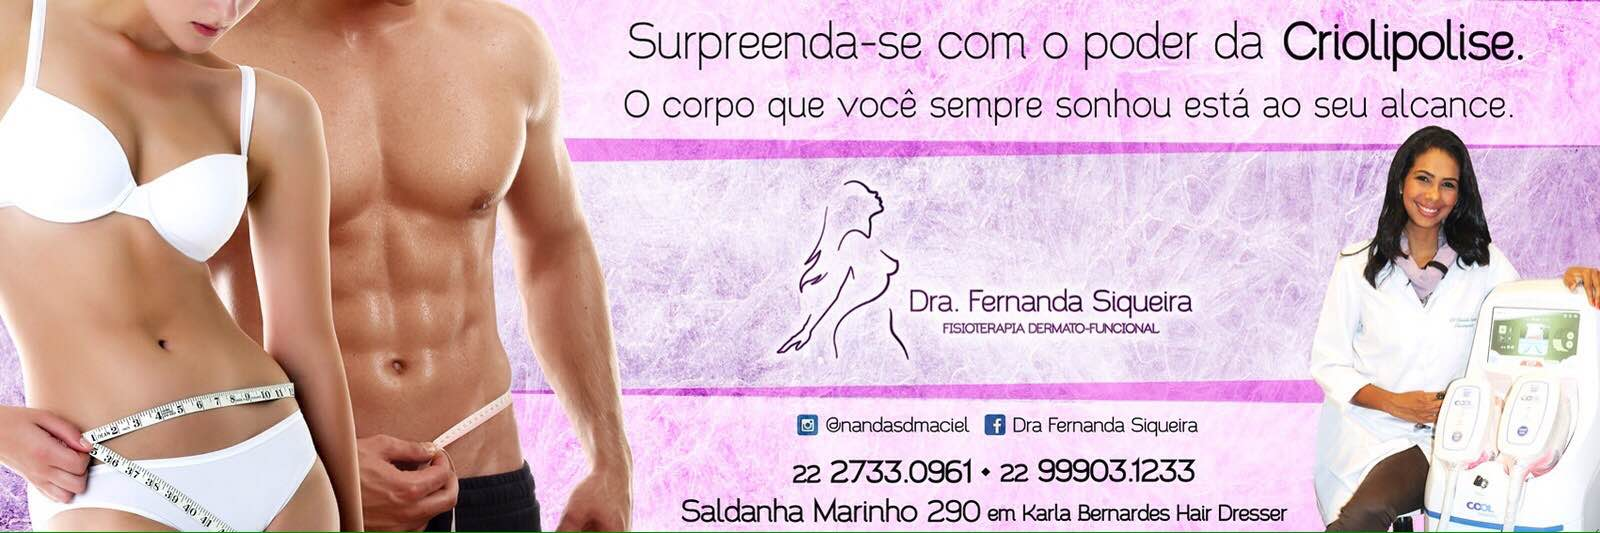 Fernanda Siqueira fisioterapeuta